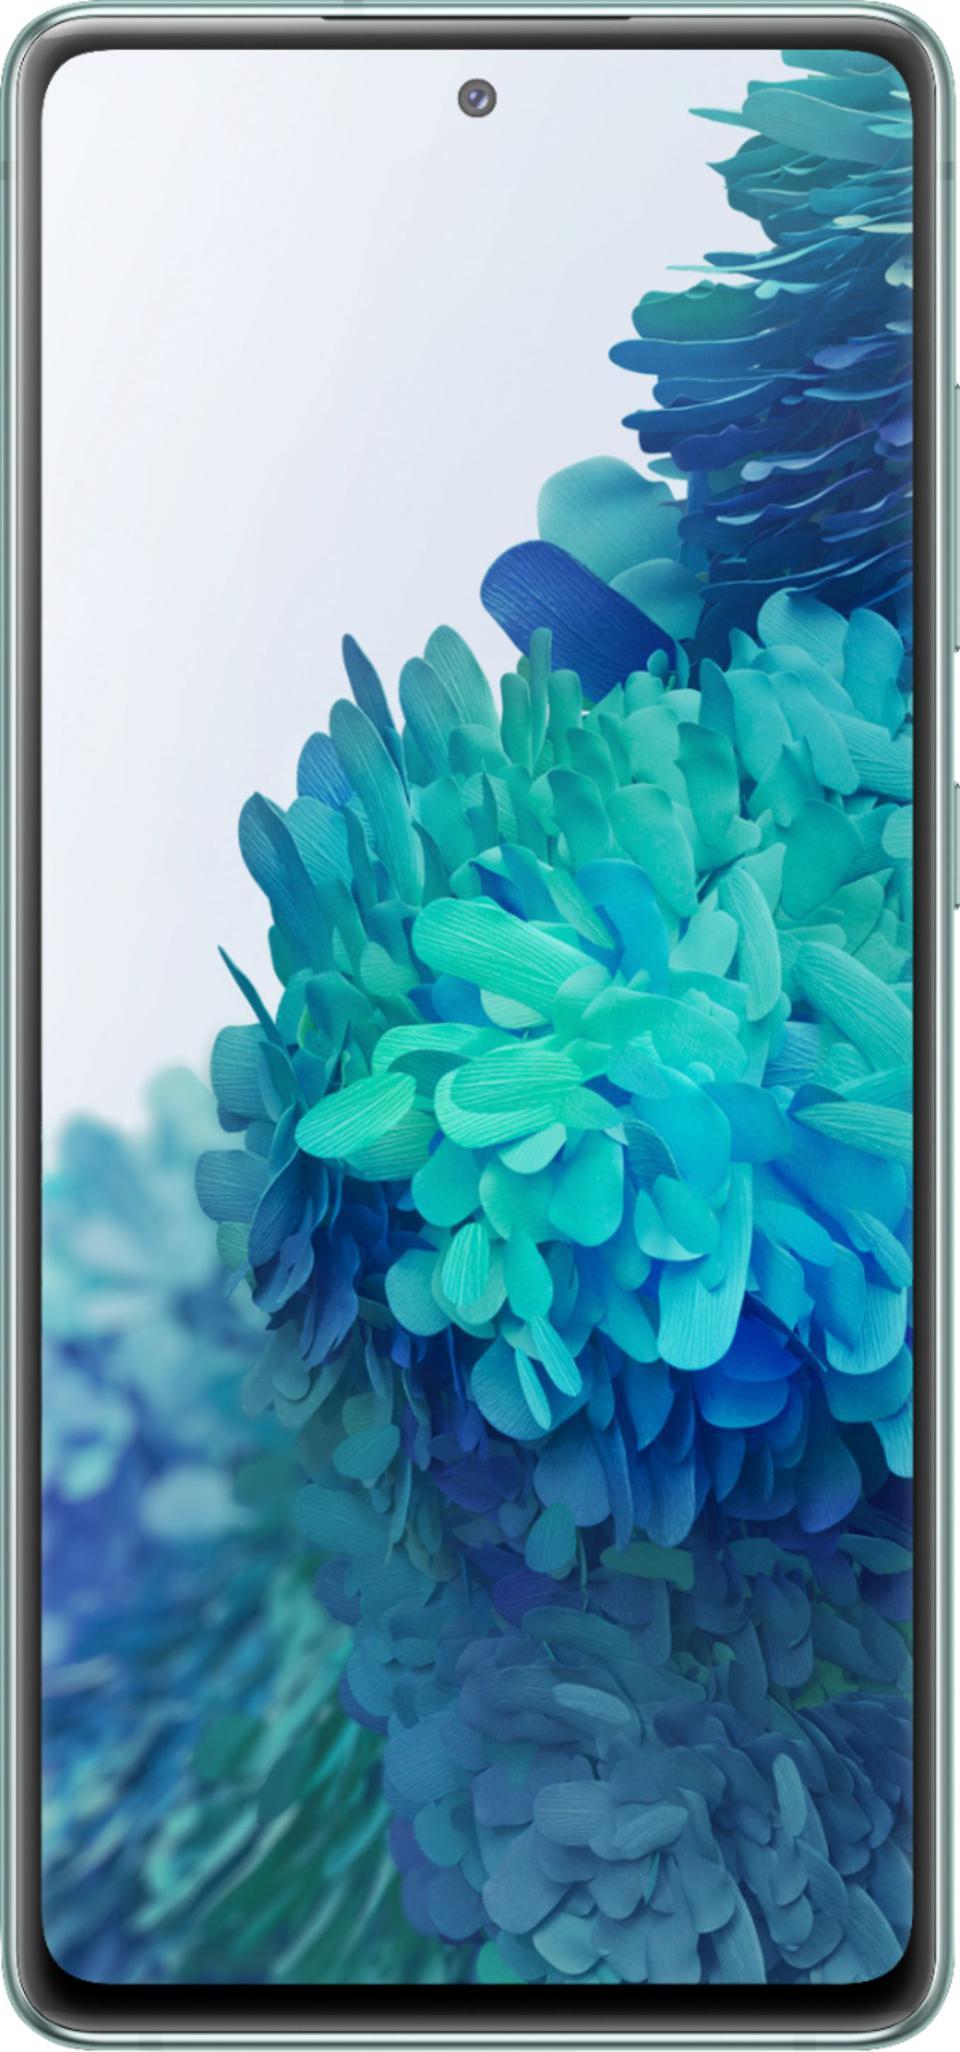 Samsung - Galaxy S20 FE 5G UW 128GB - Cloud Mint (Verizon)